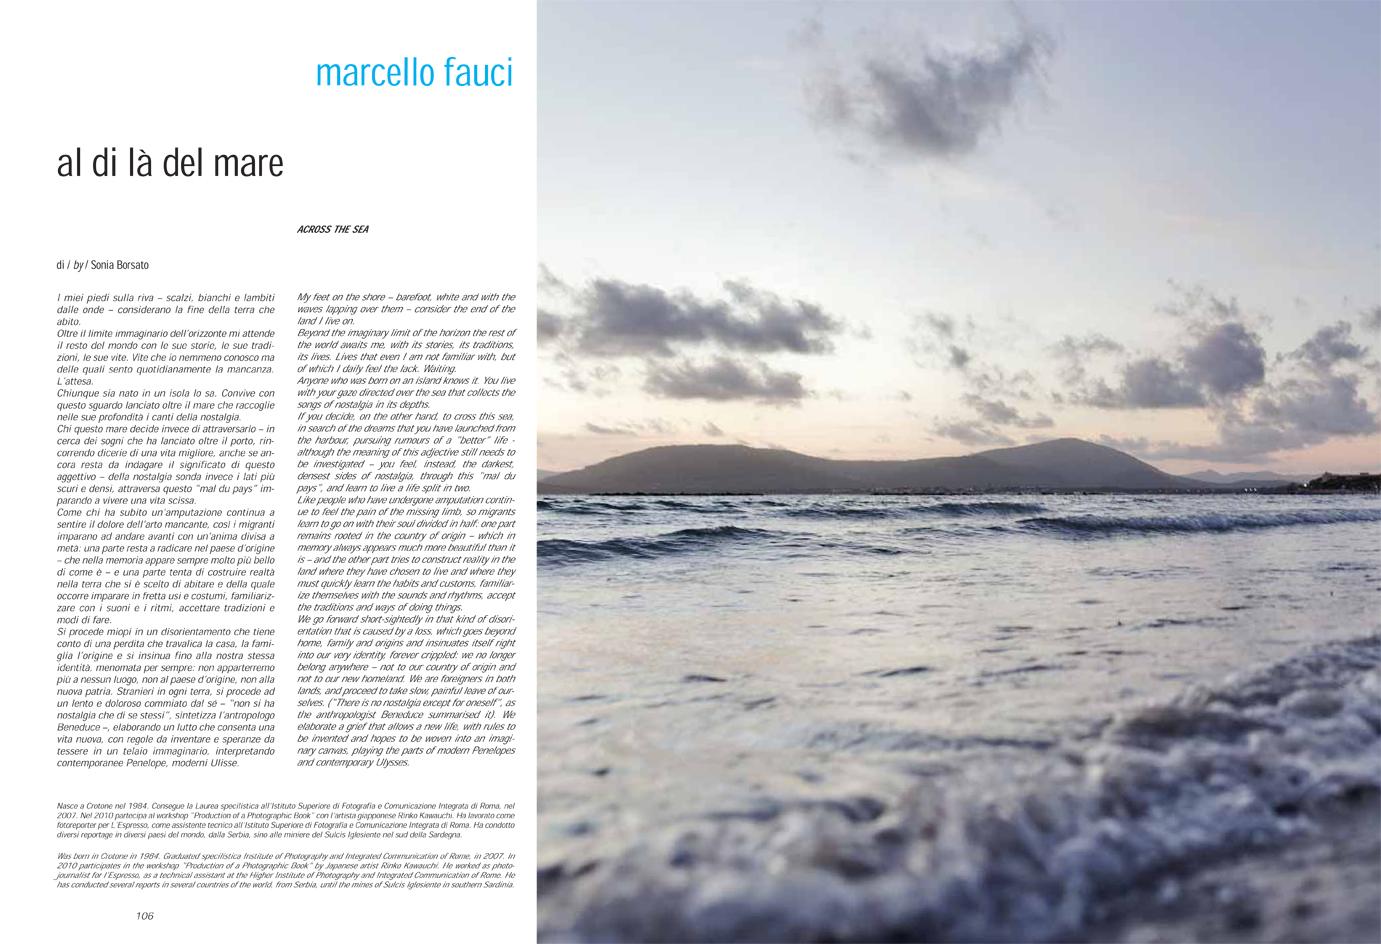 catalogo_menotrentuno_2011-54.jpg